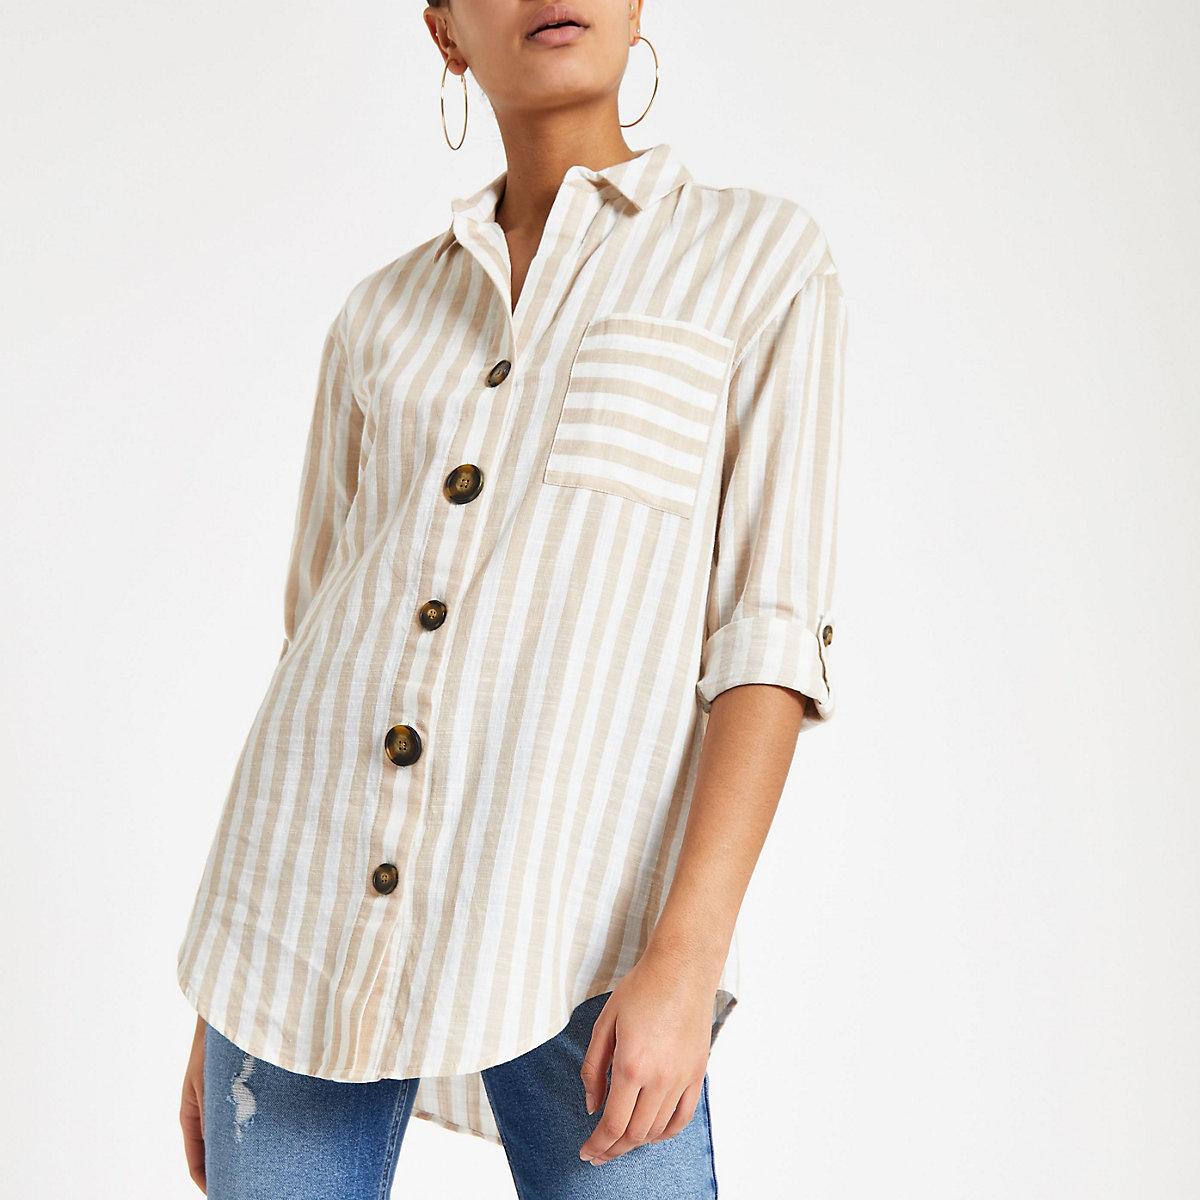 Brown stripe button front shirt